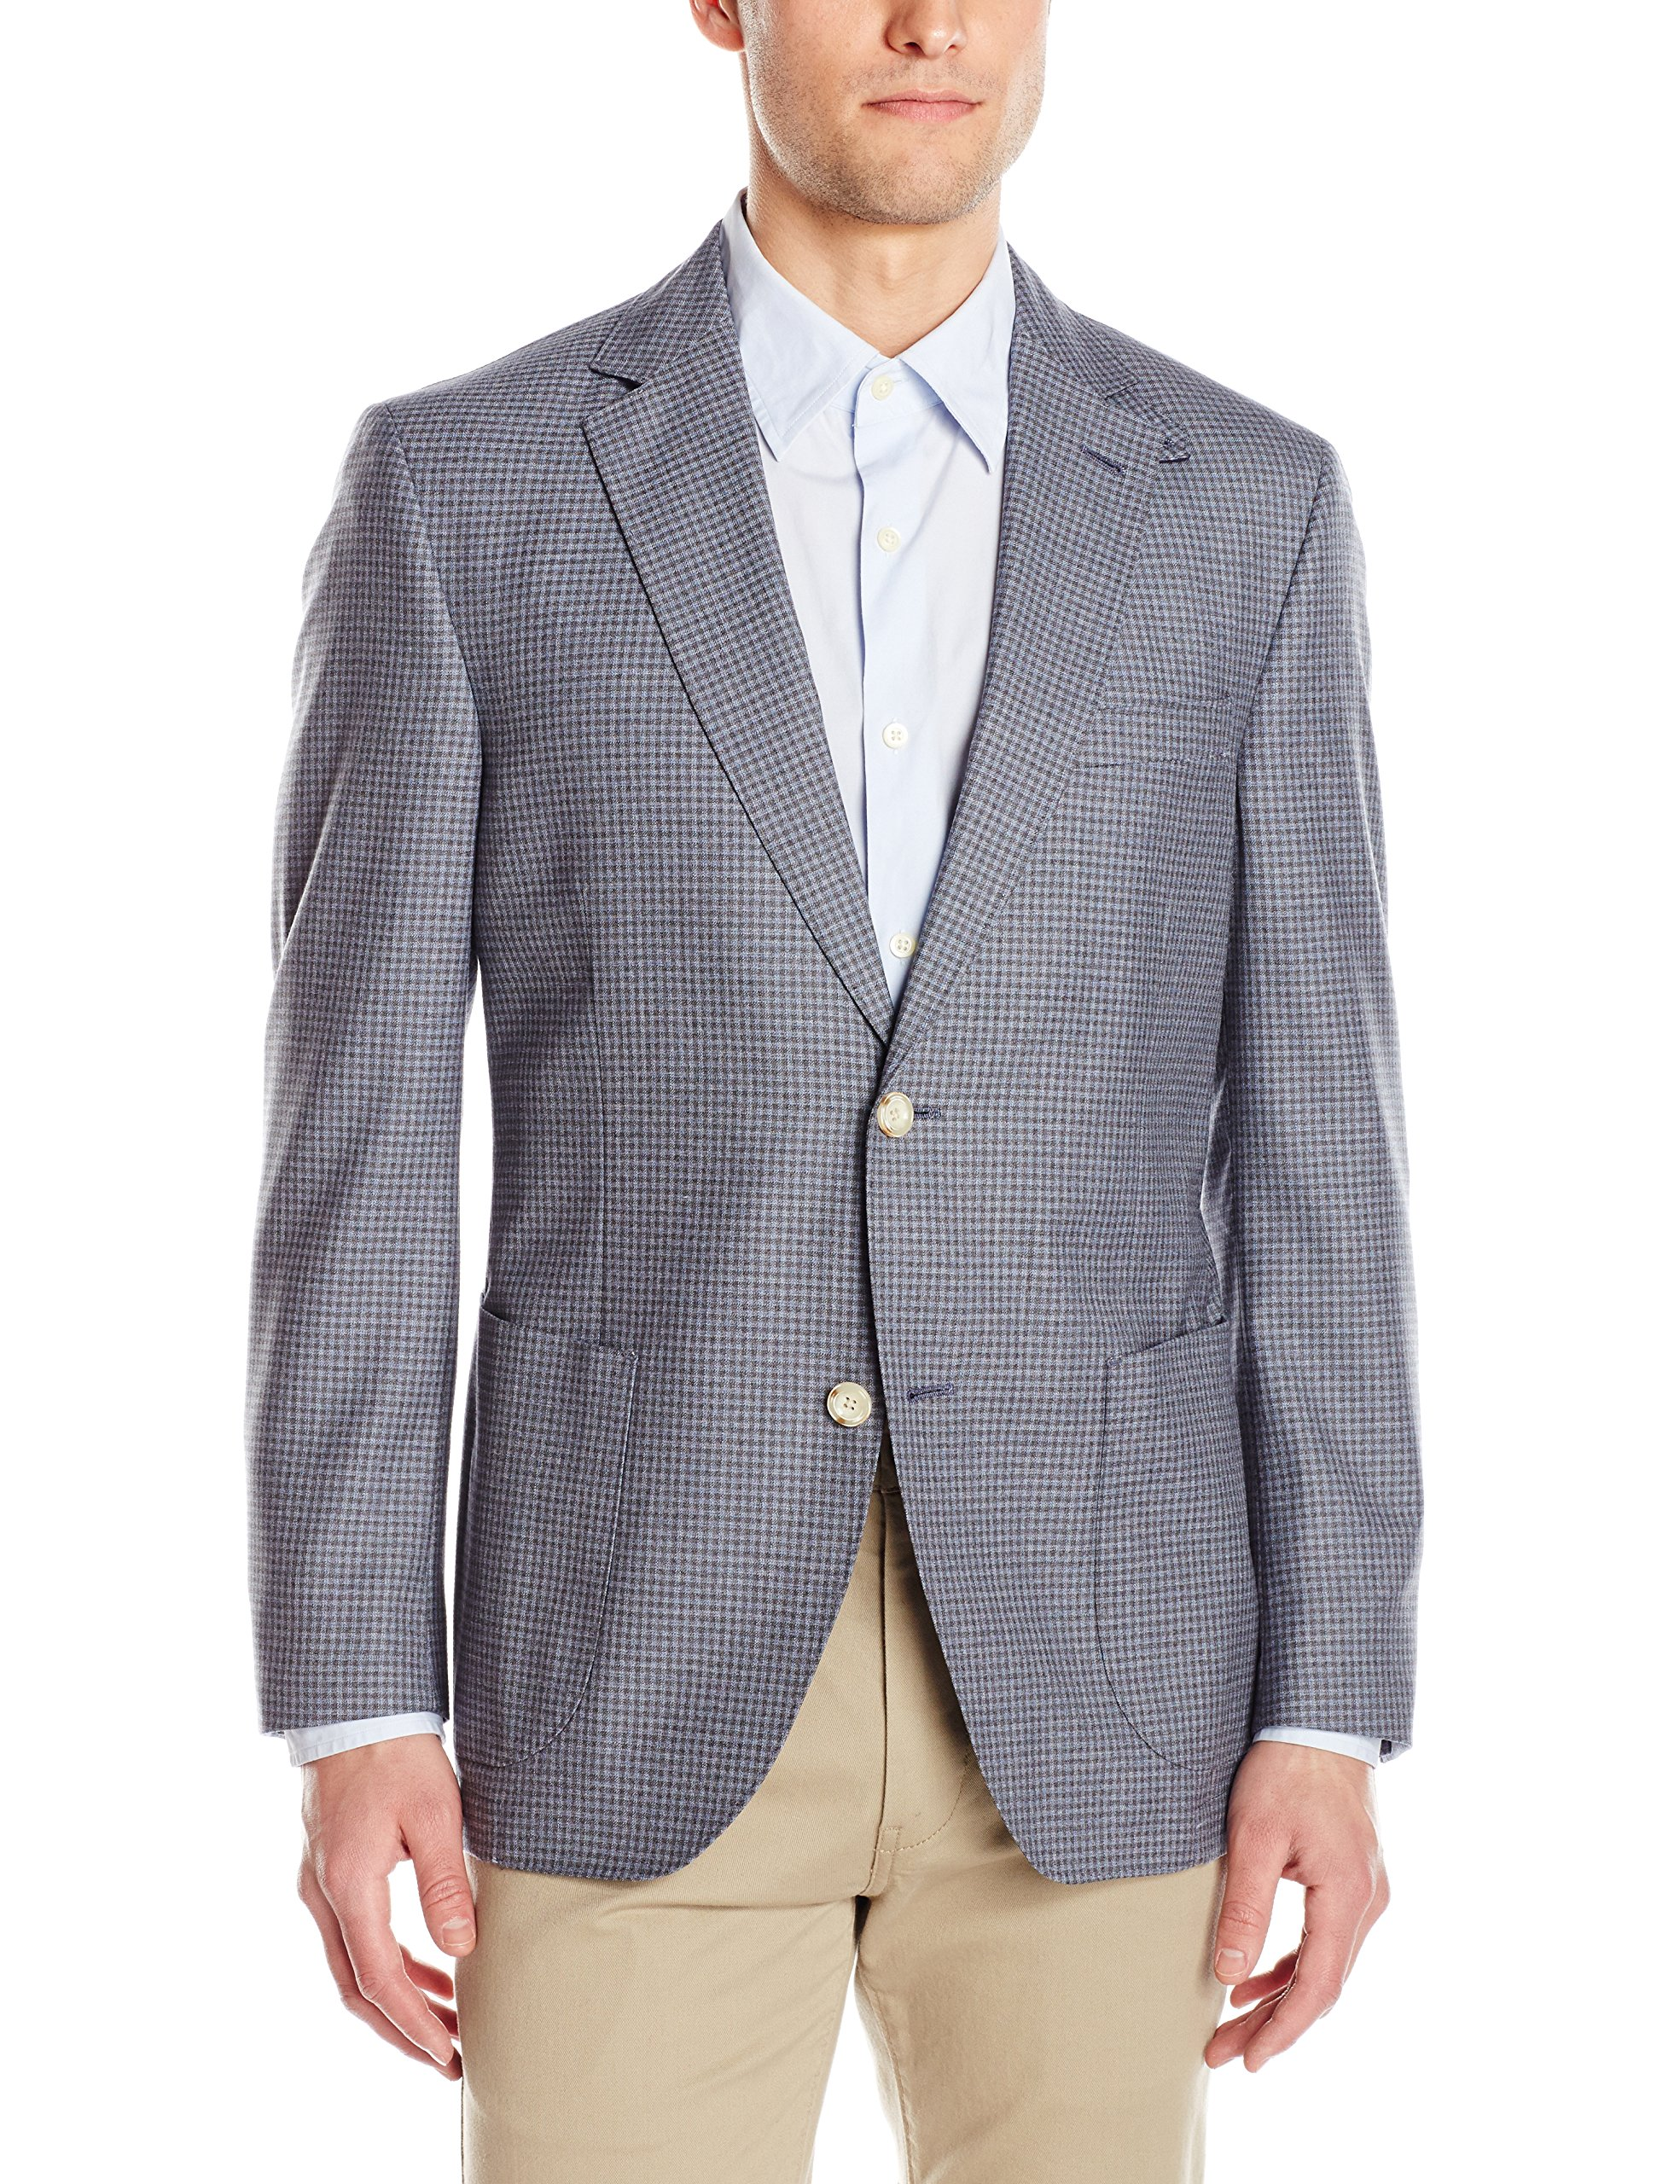 Kroon Men's Bono 2 Fancy Silk and Wool Italian Fabric, Grey, 40 Regular